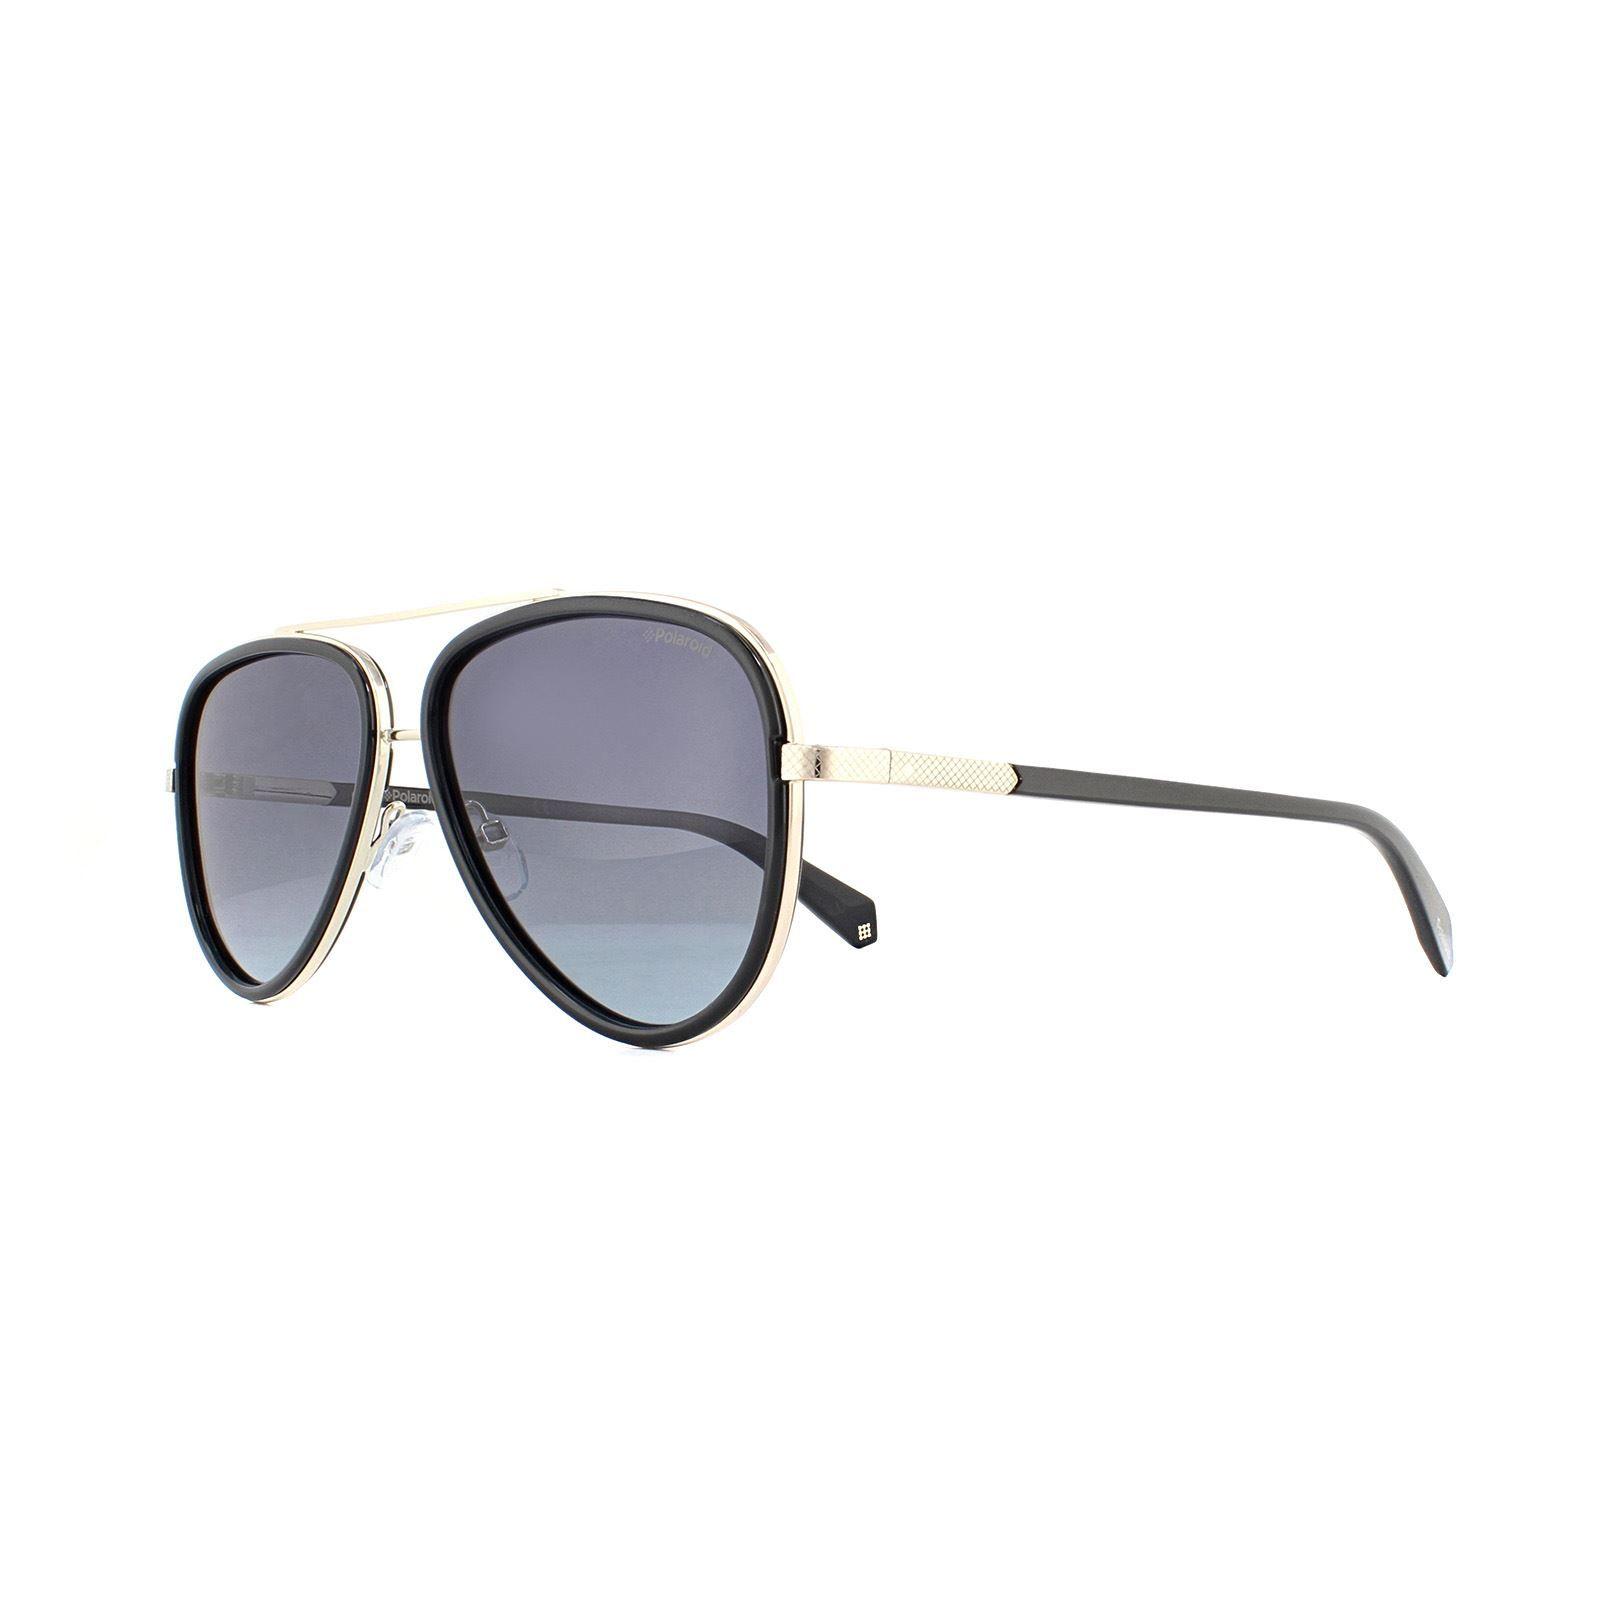 Polaroid Sunglasses PLD 2073/S 807 WJ Black Grey Gradient Polarized